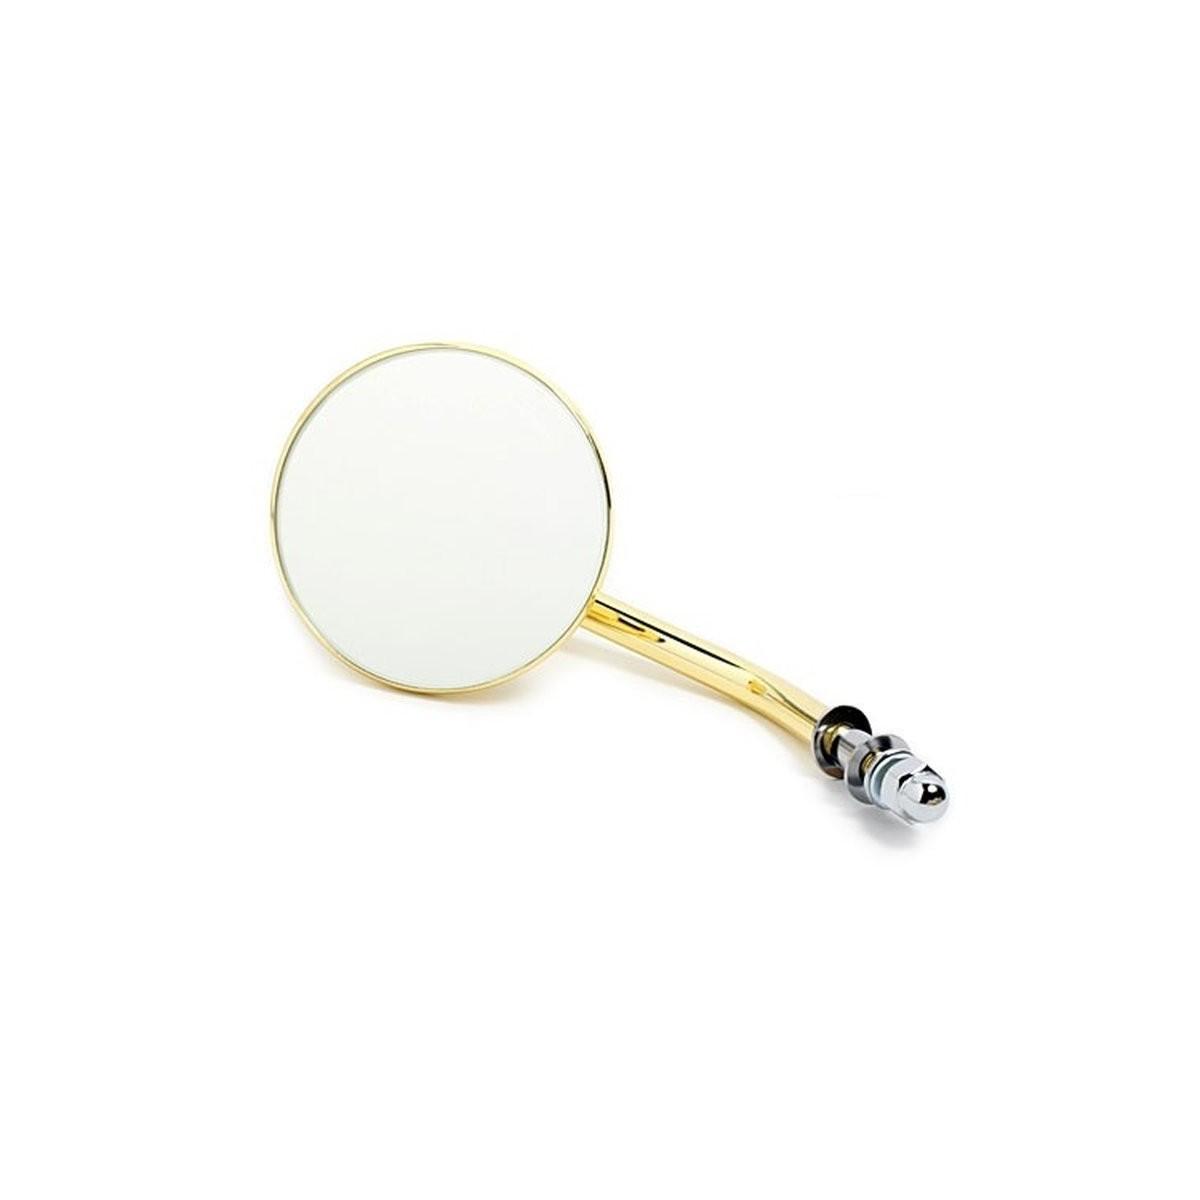 custom spiegel 3 zoll 7 5cm rund 3 gold finish f harley zemex autoelektronik. Black Bedroom Furniture Sets. Home Design Ideas